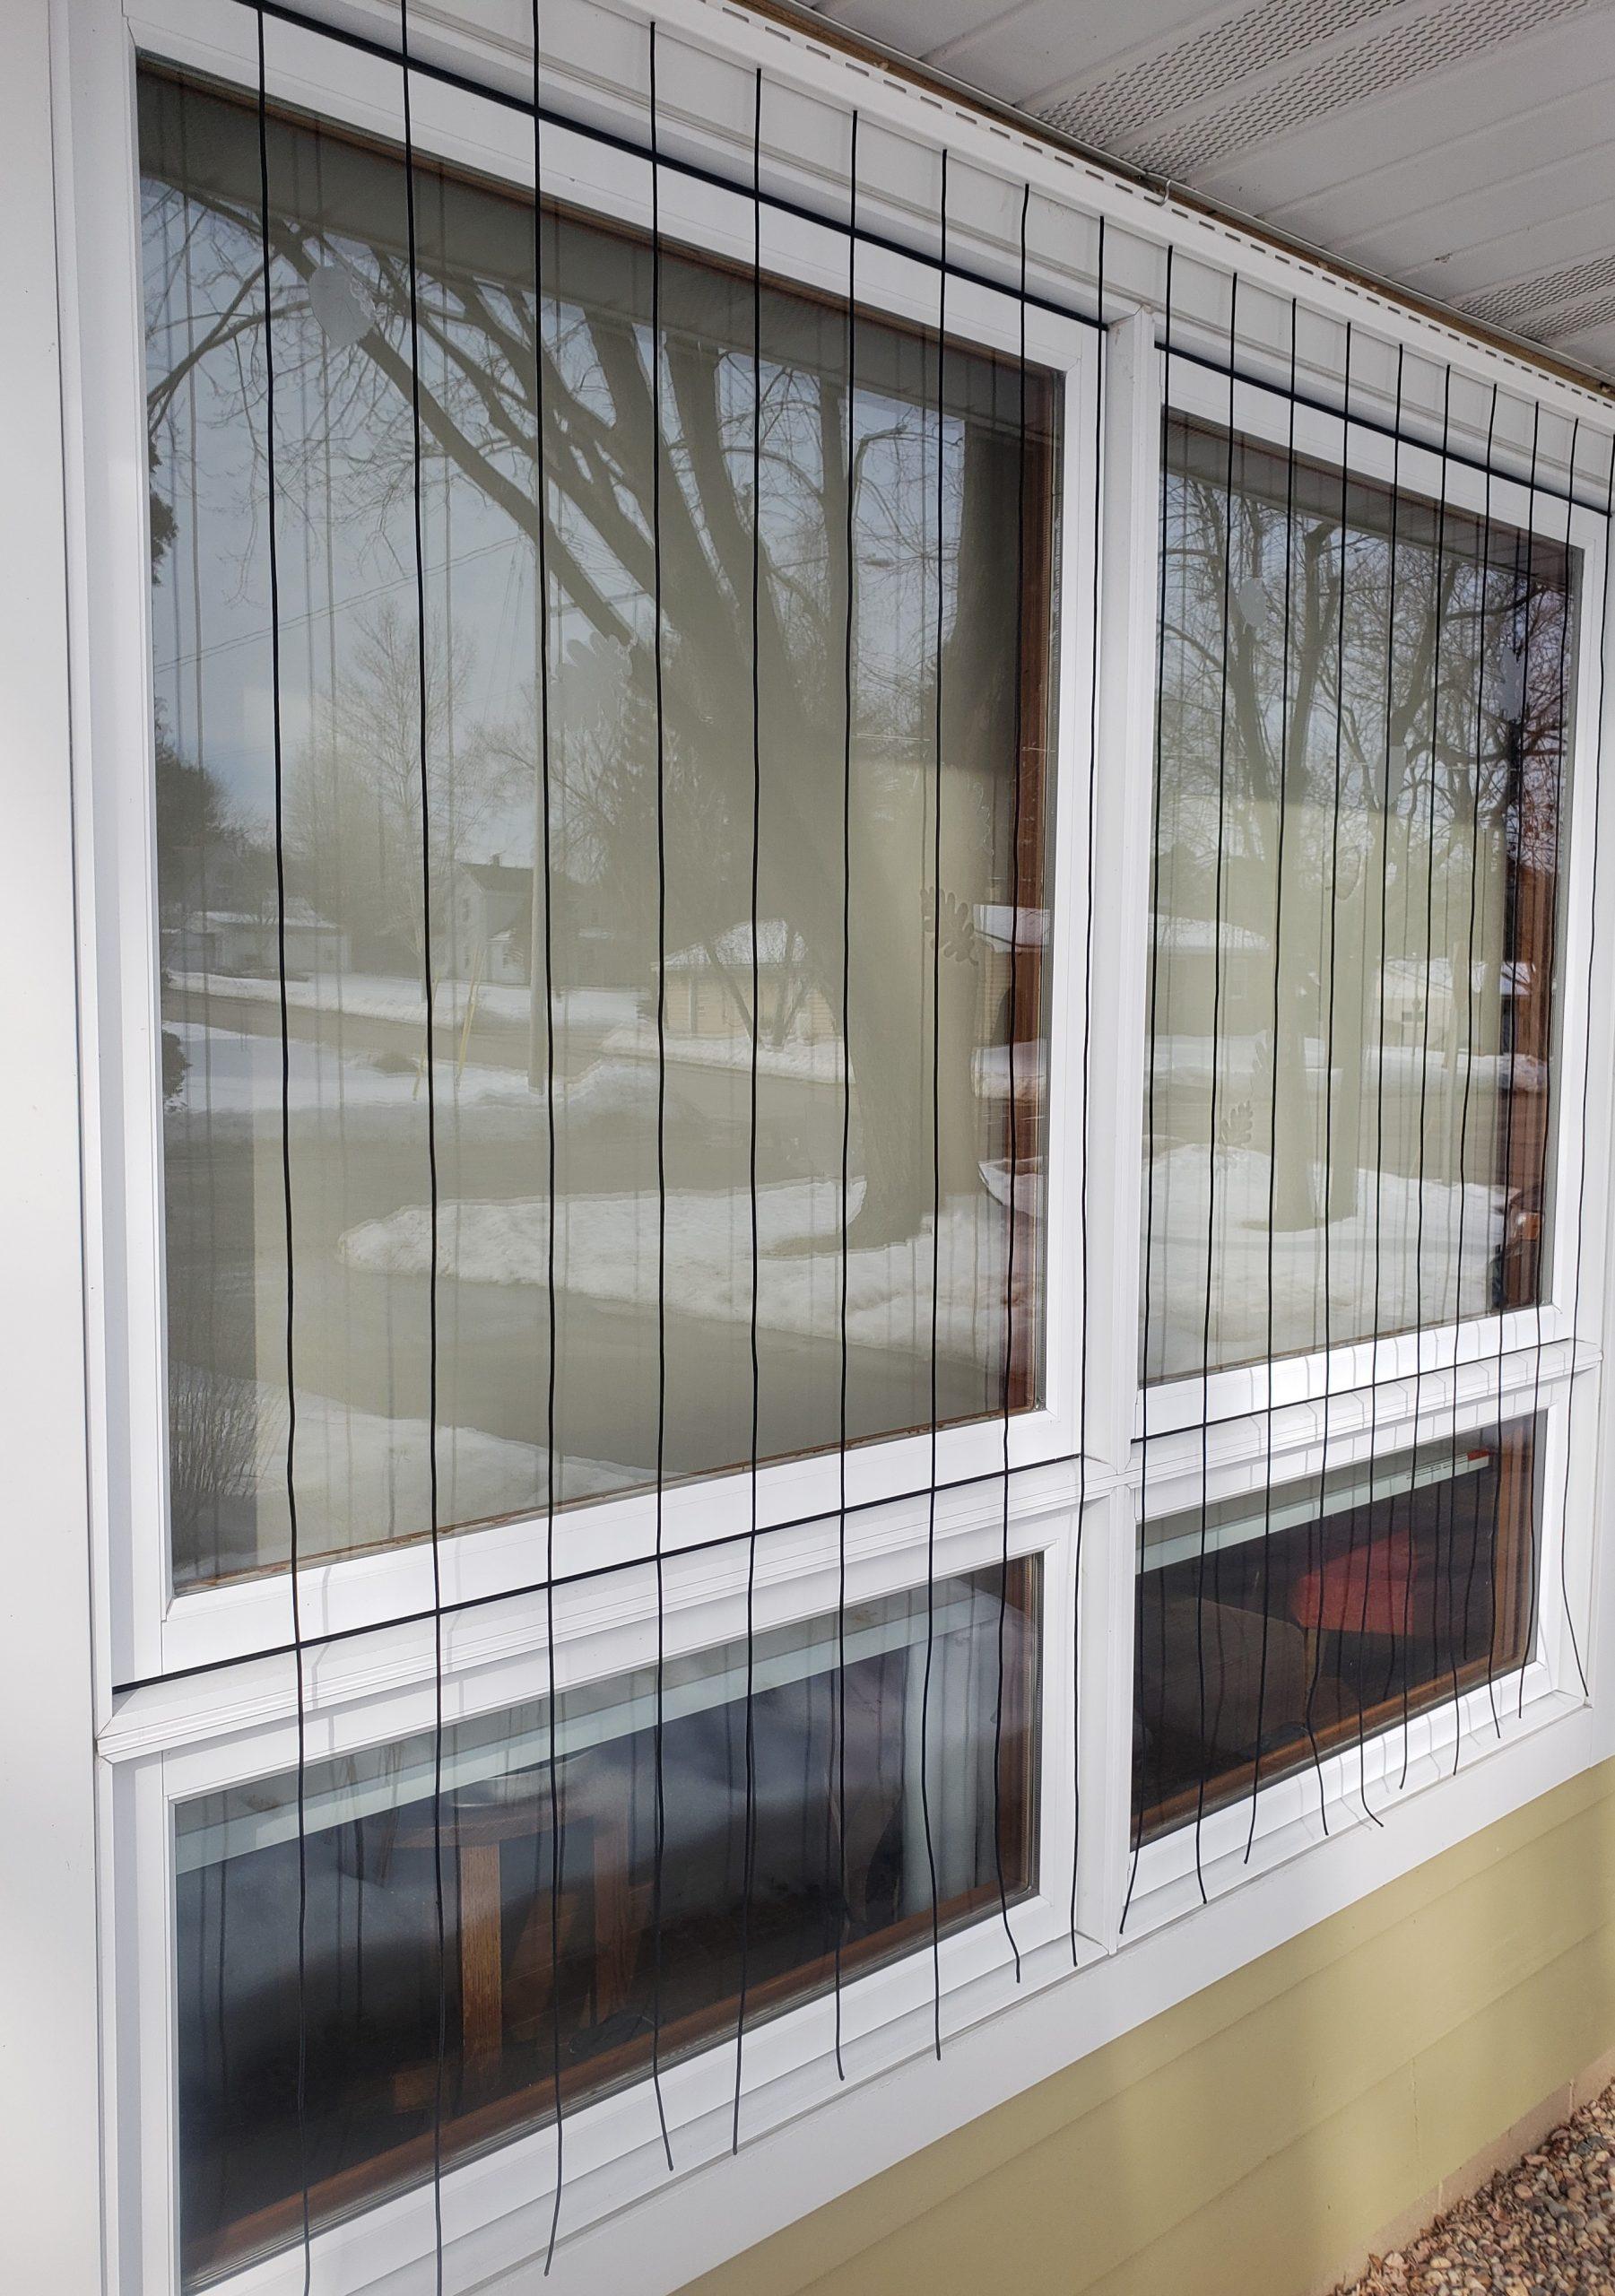 Homemade window bird-strike protector